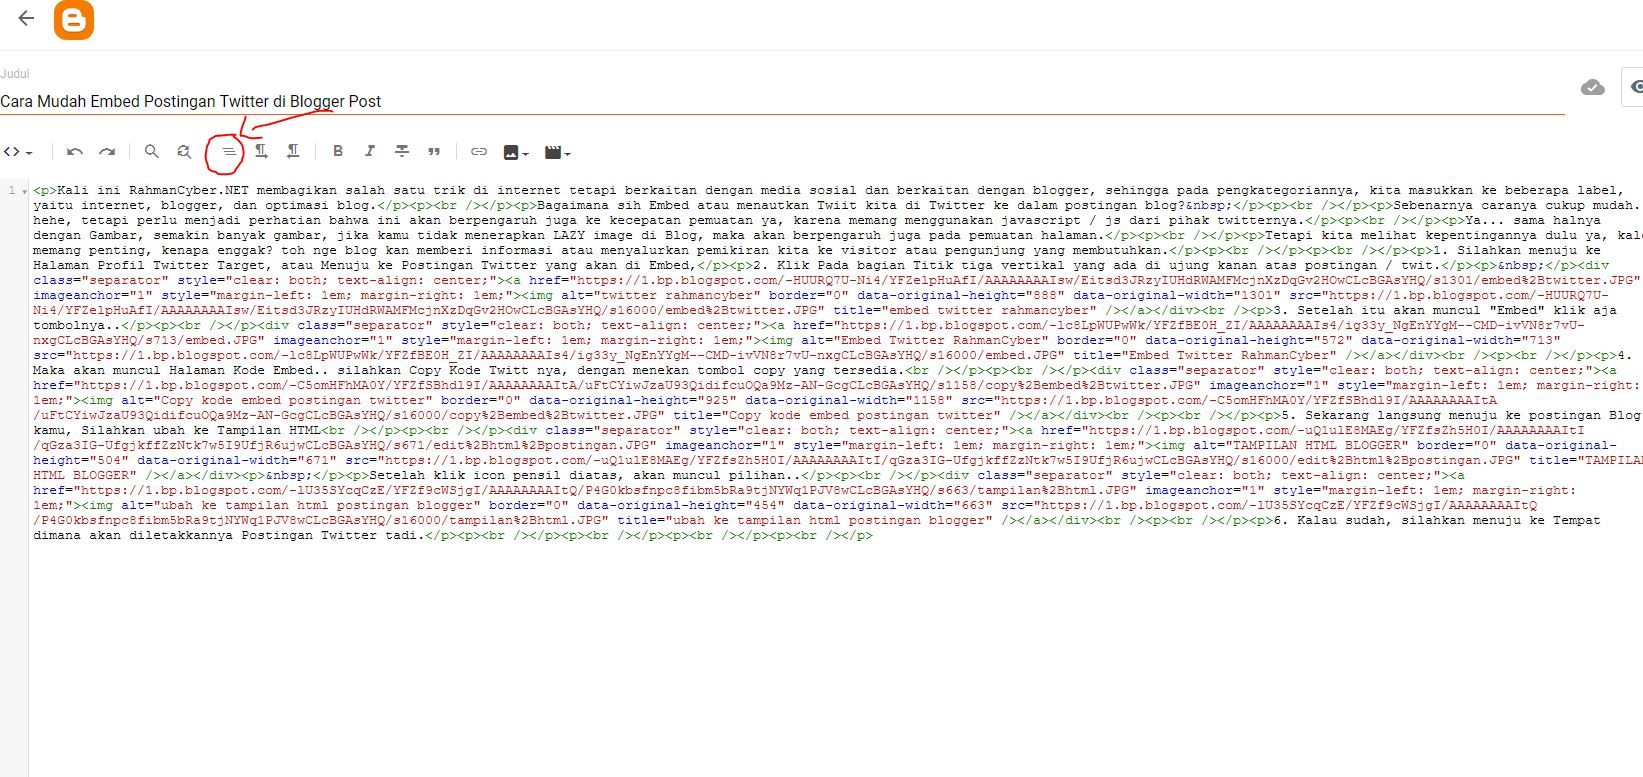 Format kode html